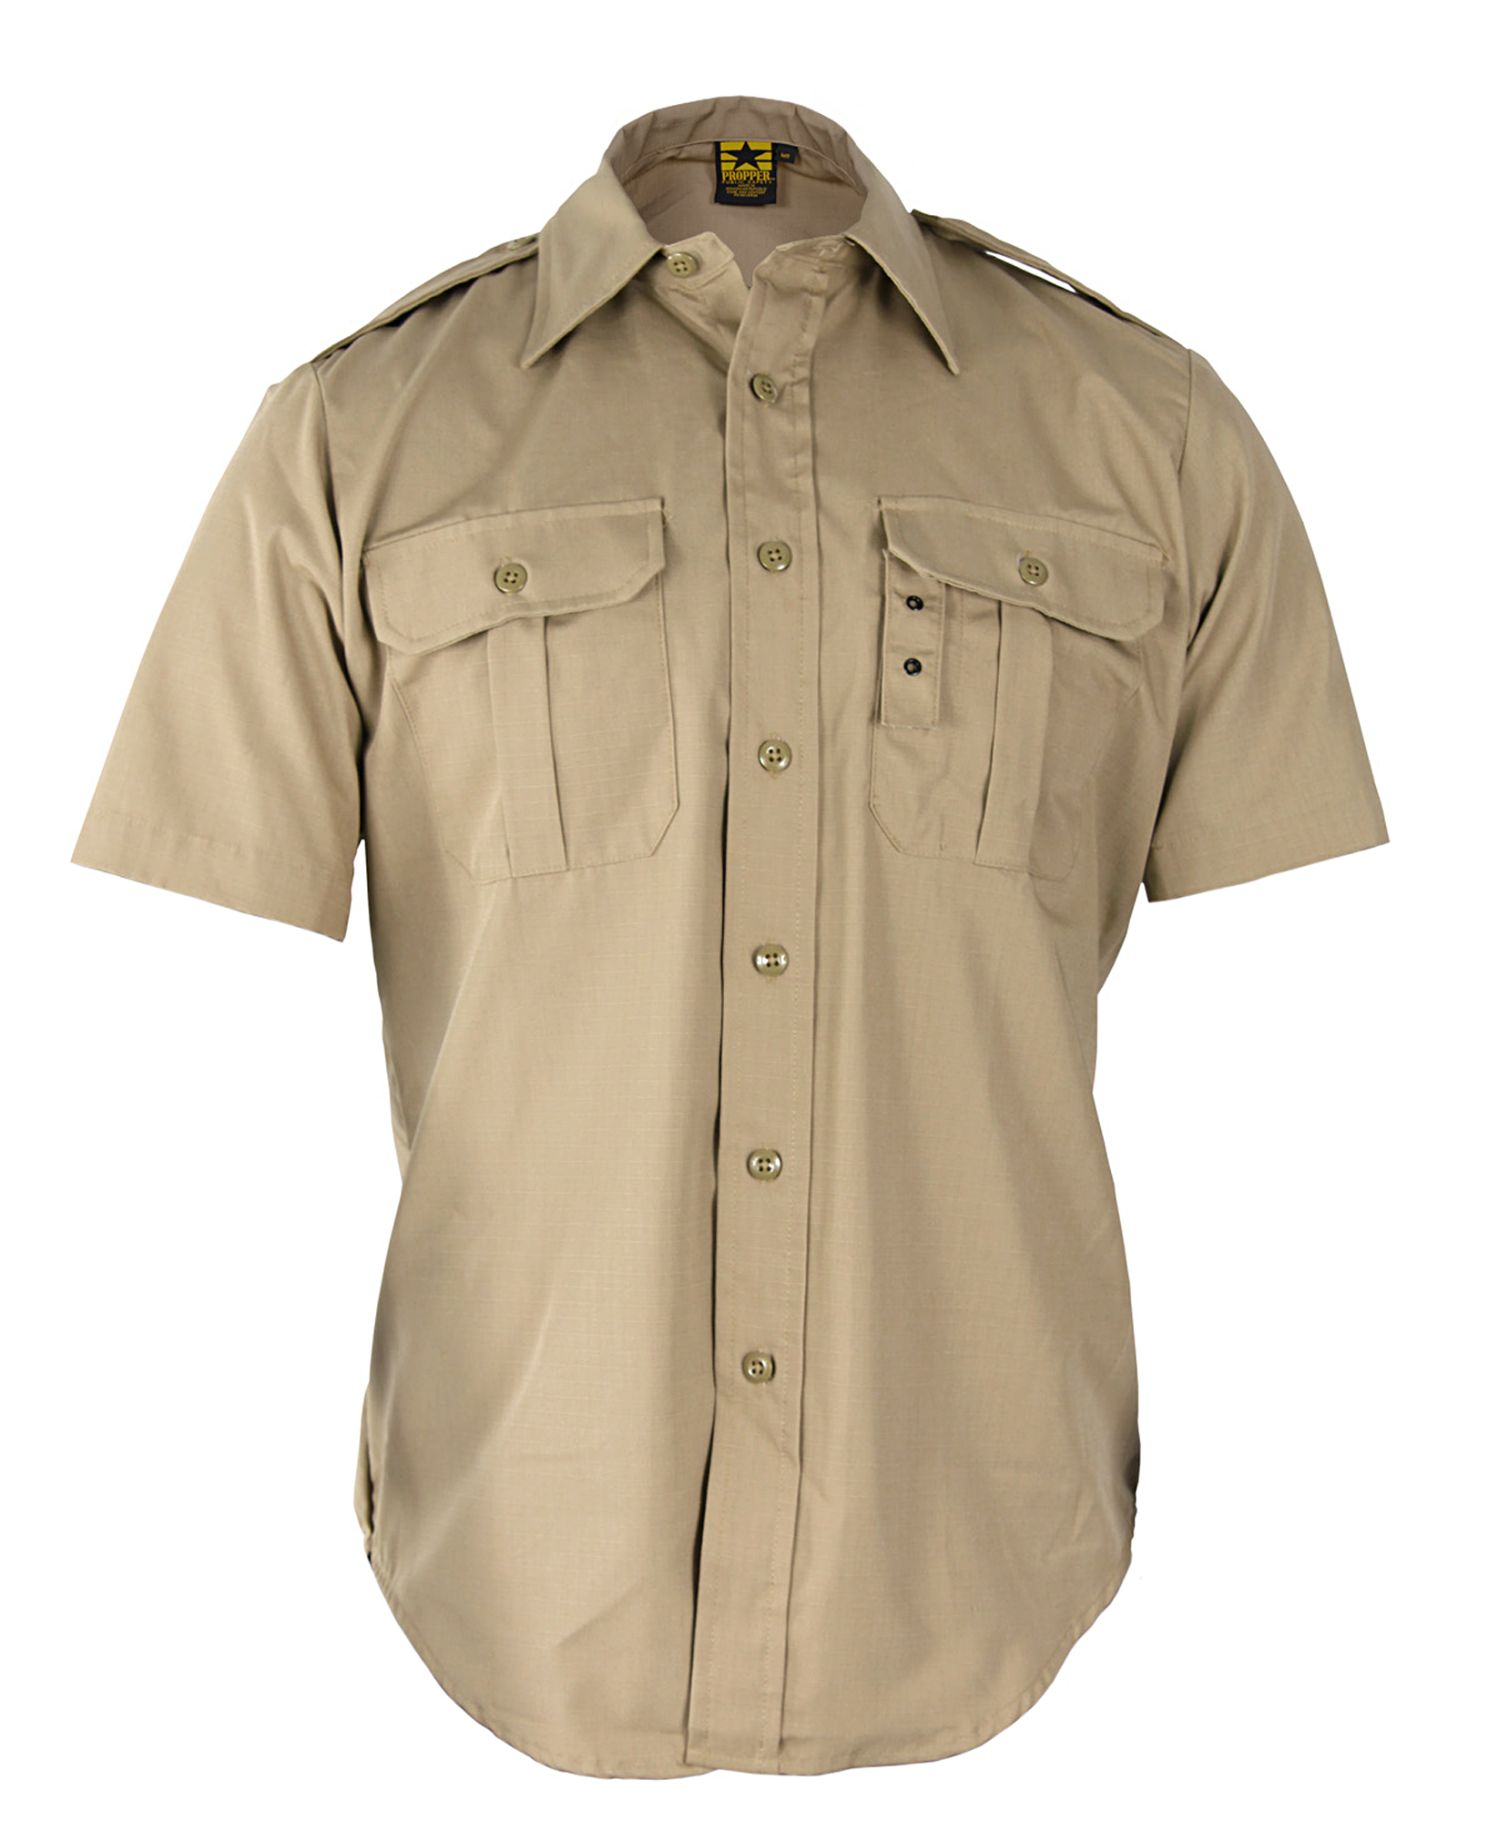 PROPPER ® Womens Tactical Shirt - Short Sleeve-Propper